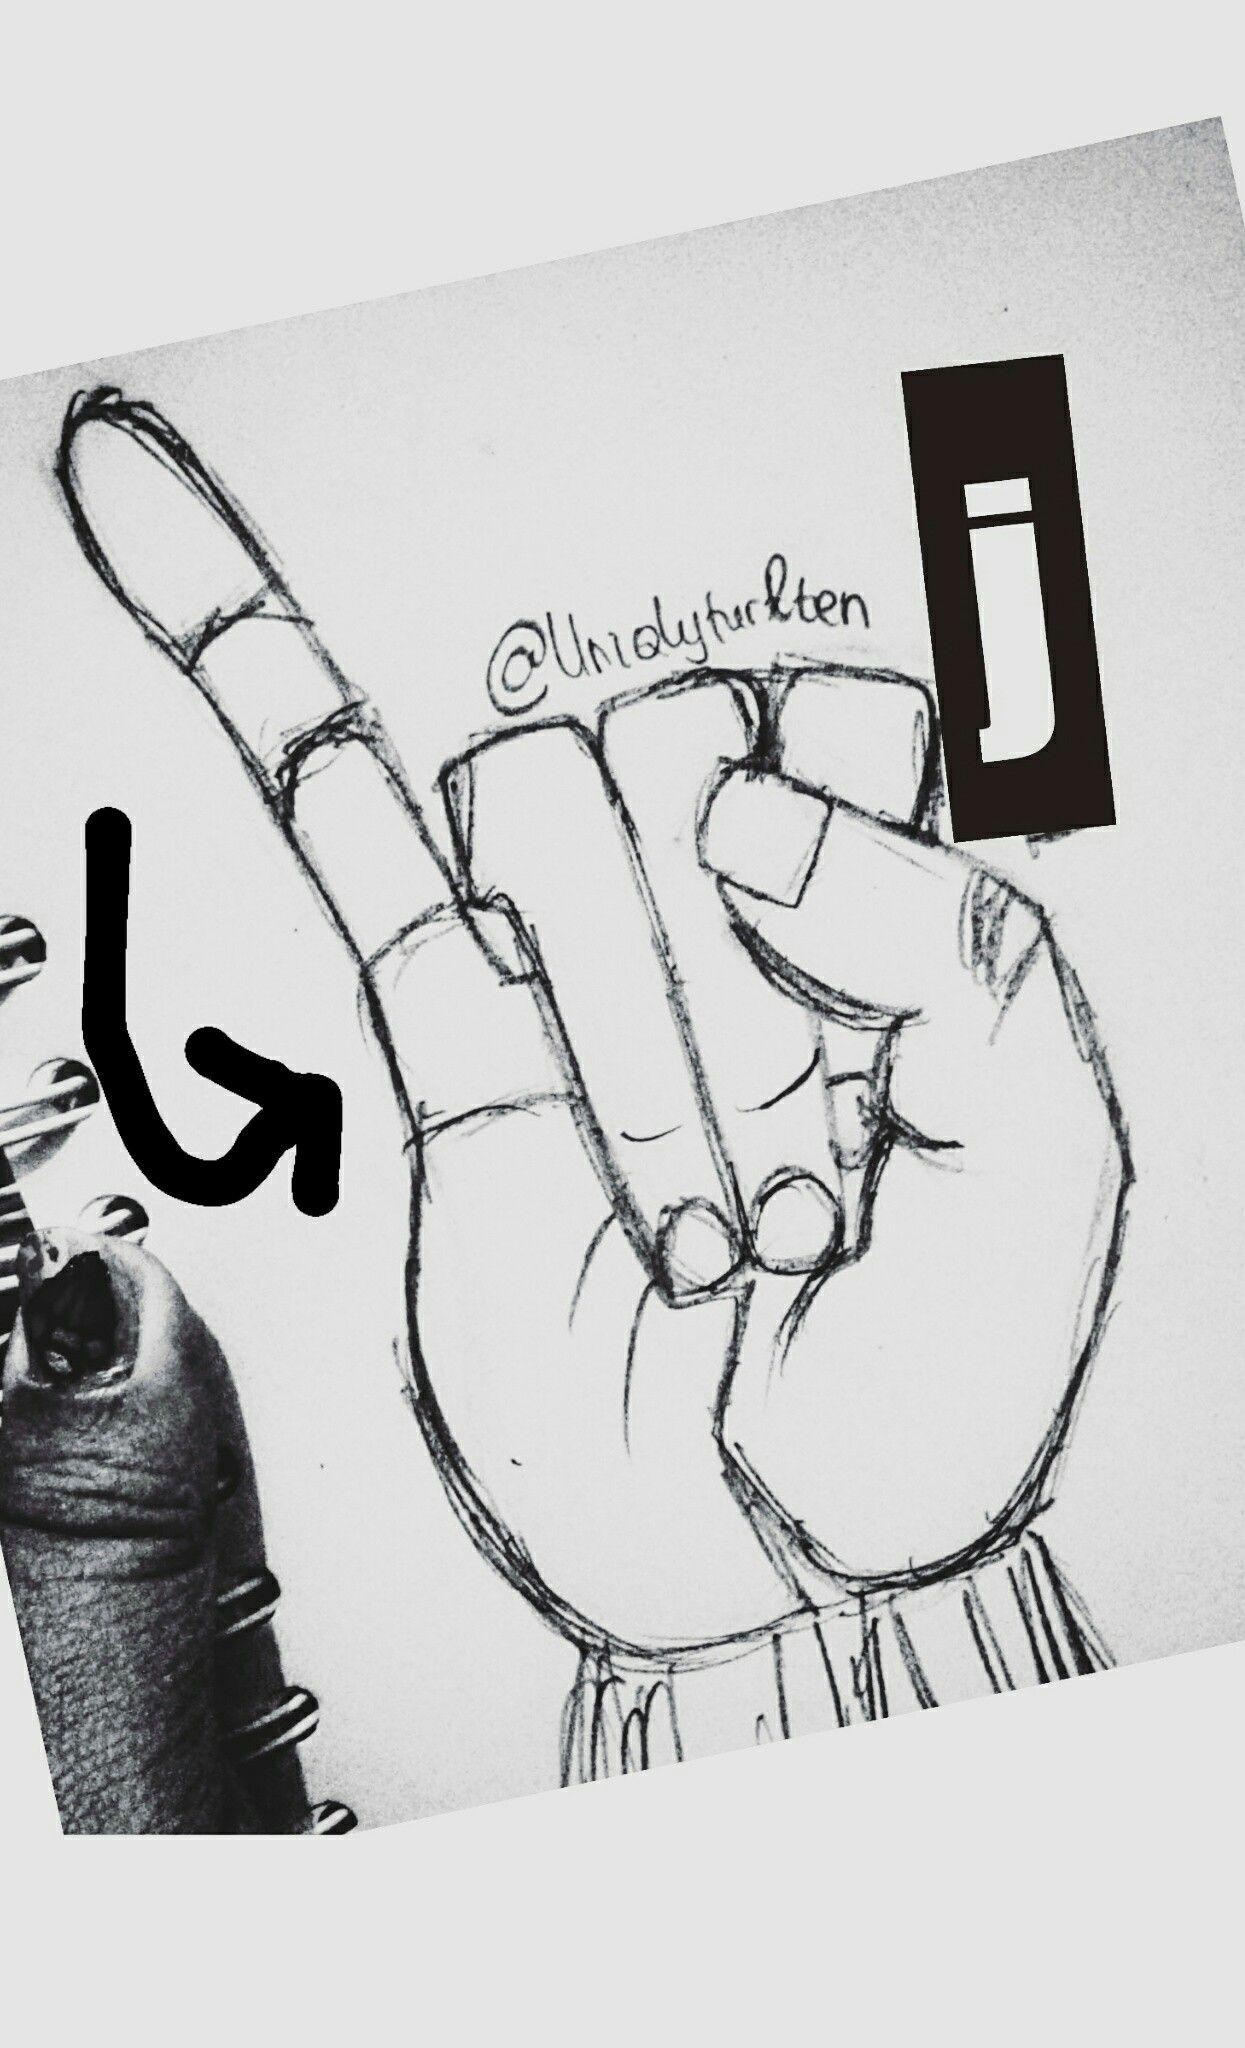 j of sign language asl signlanguage j alphabet